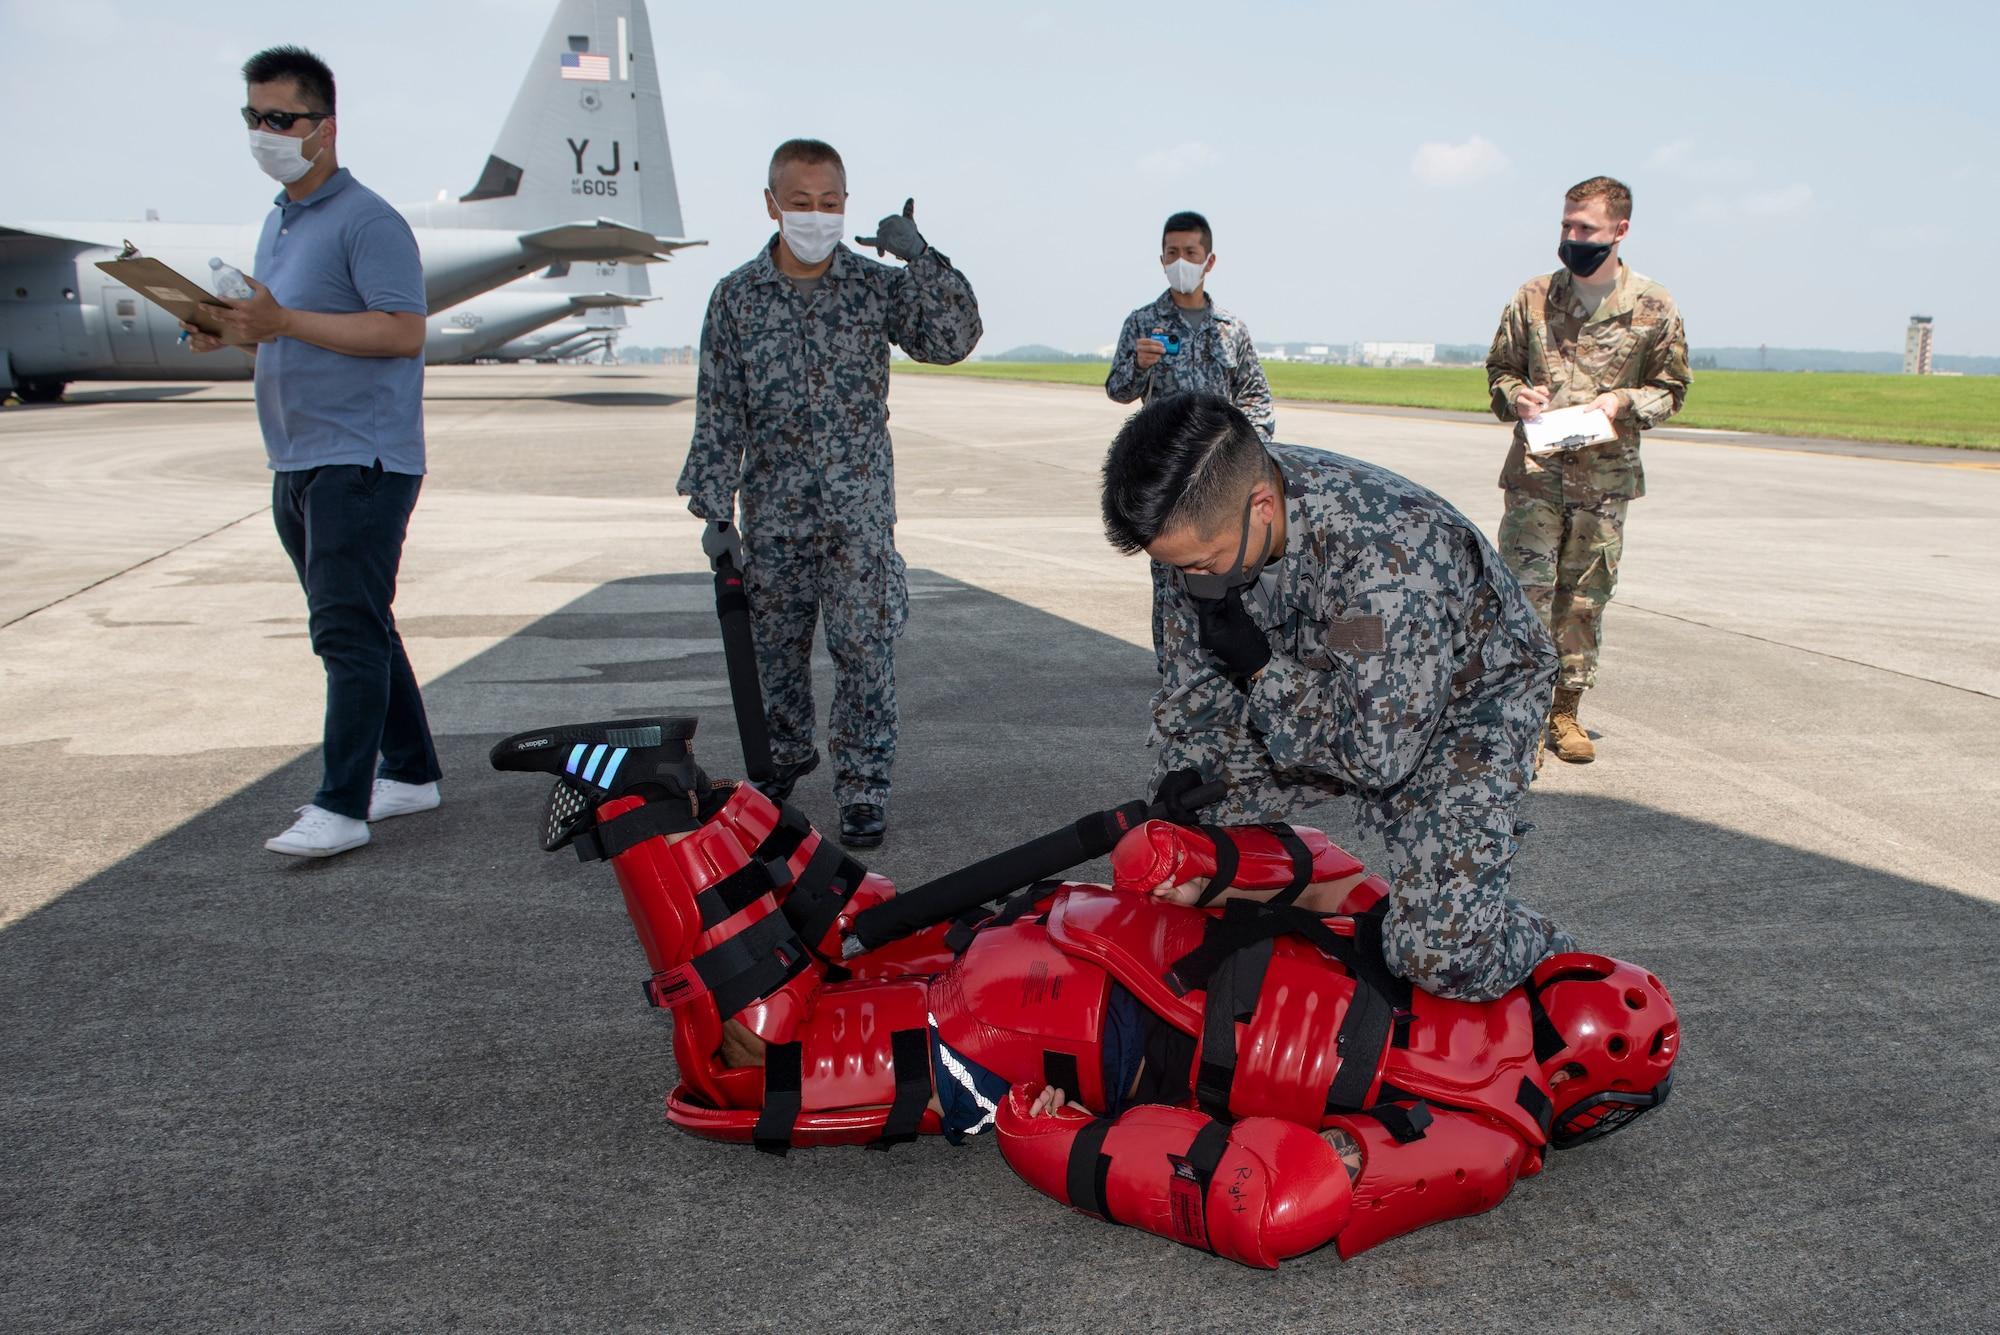 A Koku-Jieitai (Japan Air Self-Defense Force) member apprehends a simulated intruder during a flightline intrusion scenario as a portion of the bilateral aircraft security training at Yokota Air Base, Japan, August 7, 2020.